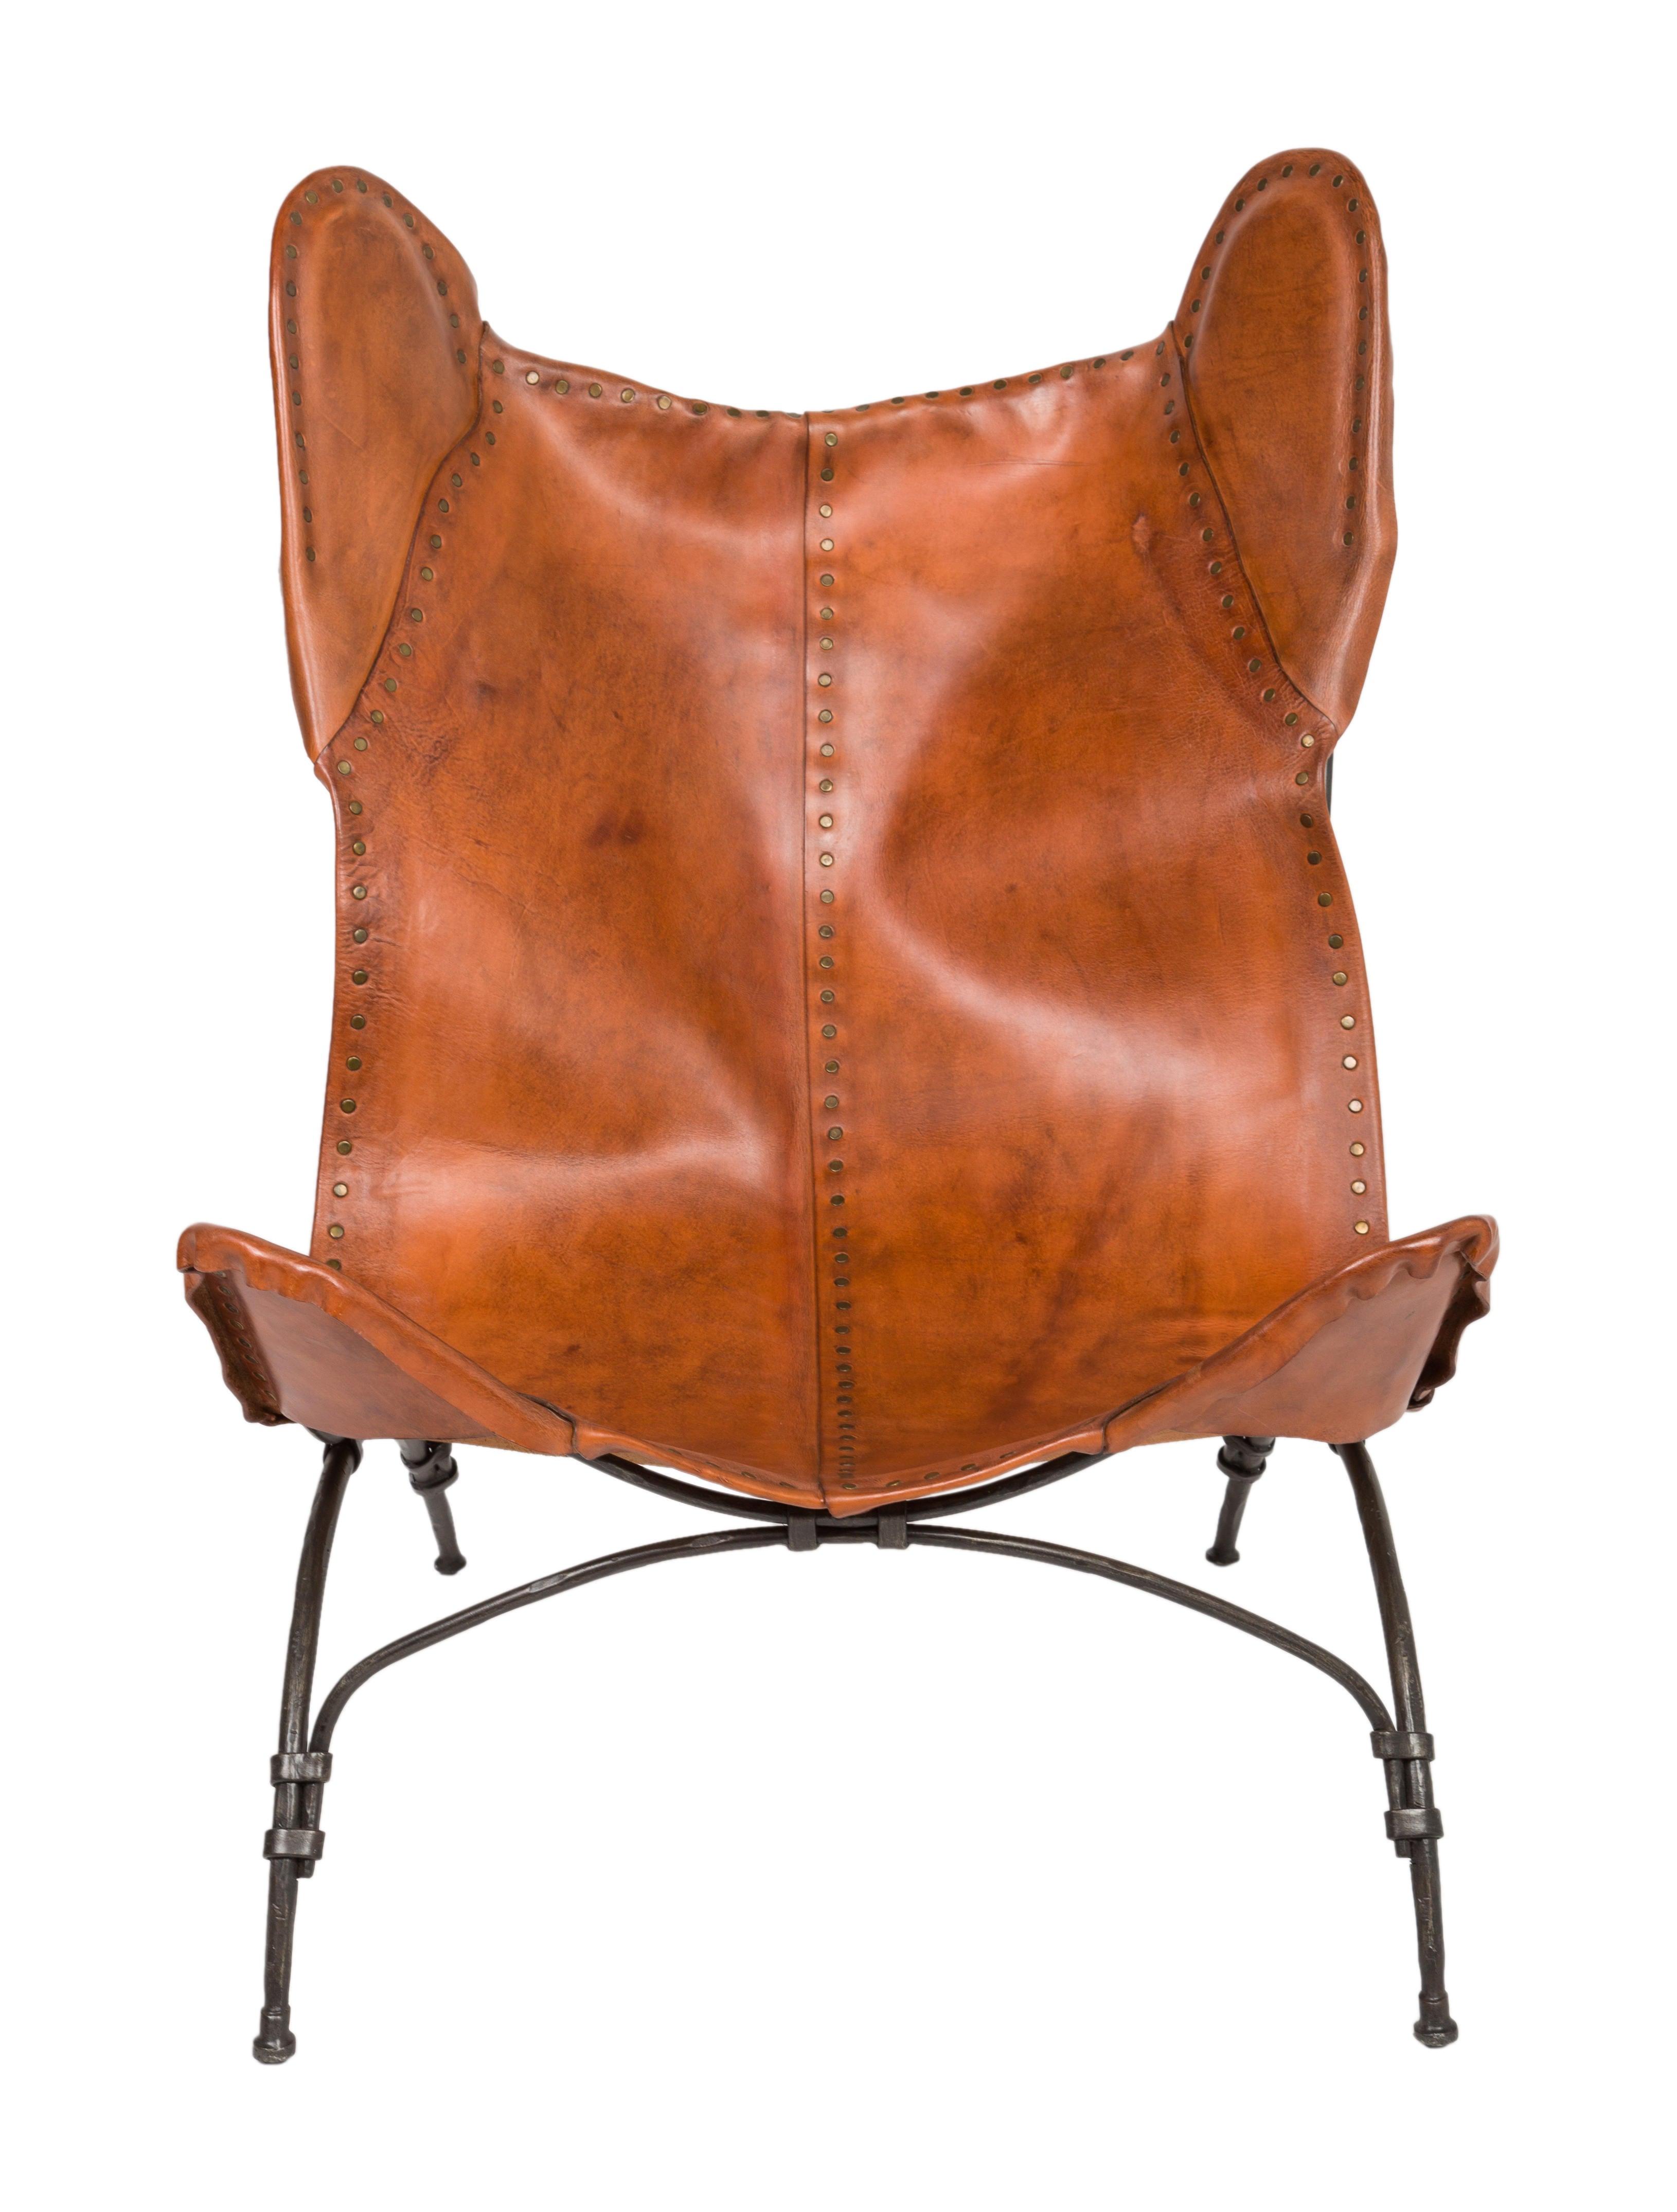 New Safari Camp Chair